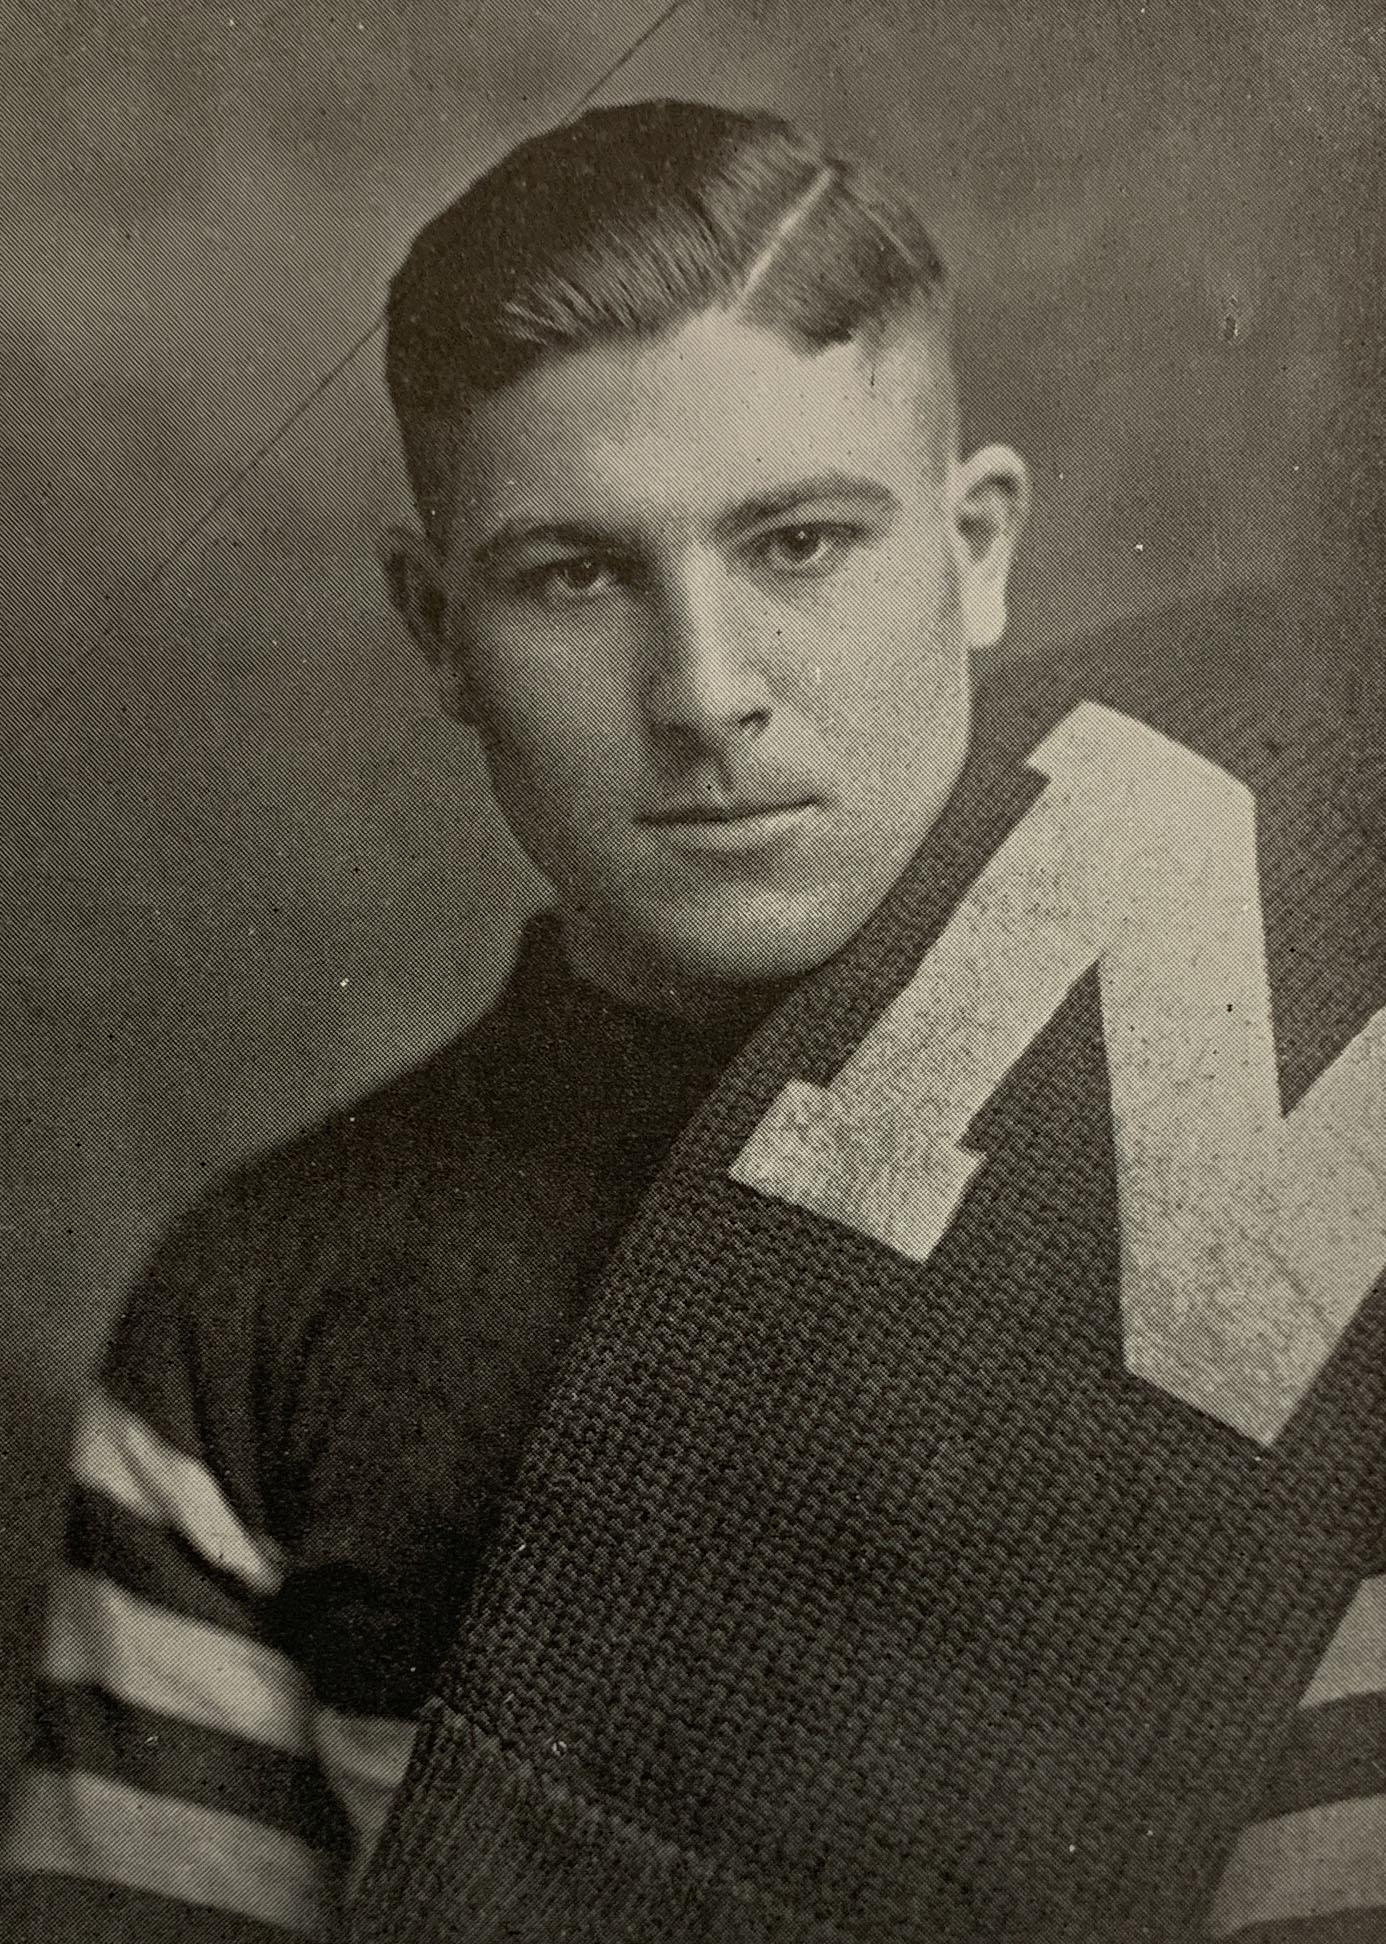 Photo of Ernest Hubka